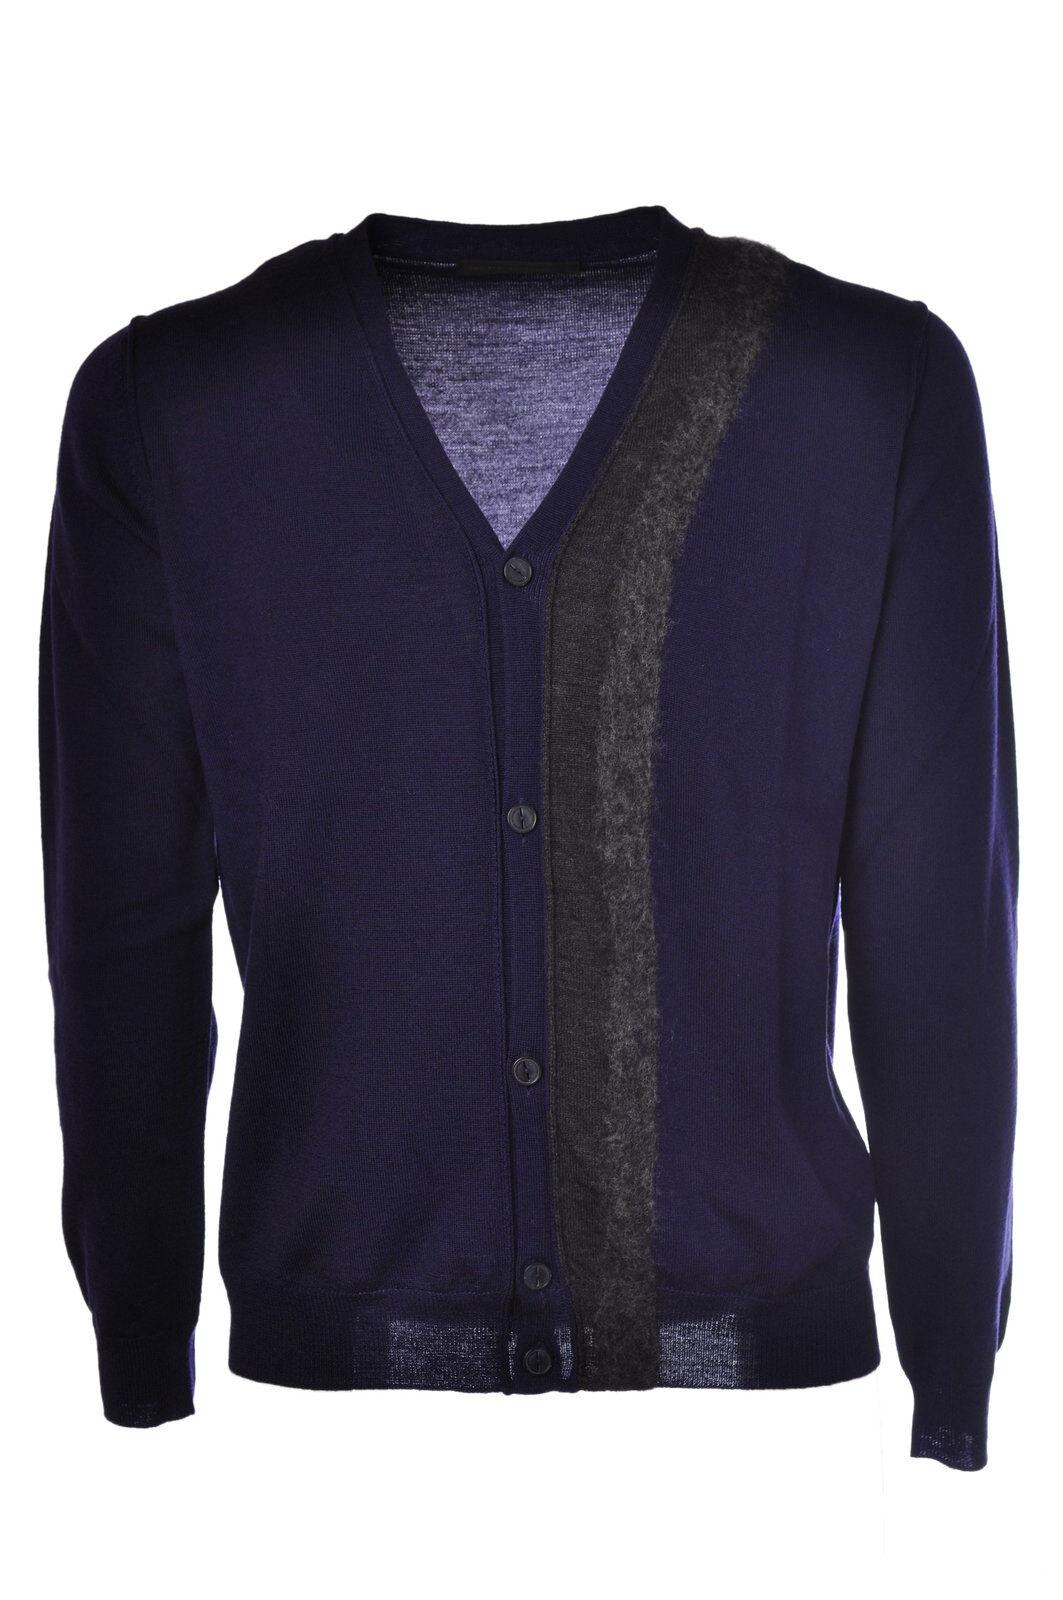 Daniele Alessandrini - Knitwear-Cardigan - Man - Blau - 463815C184924